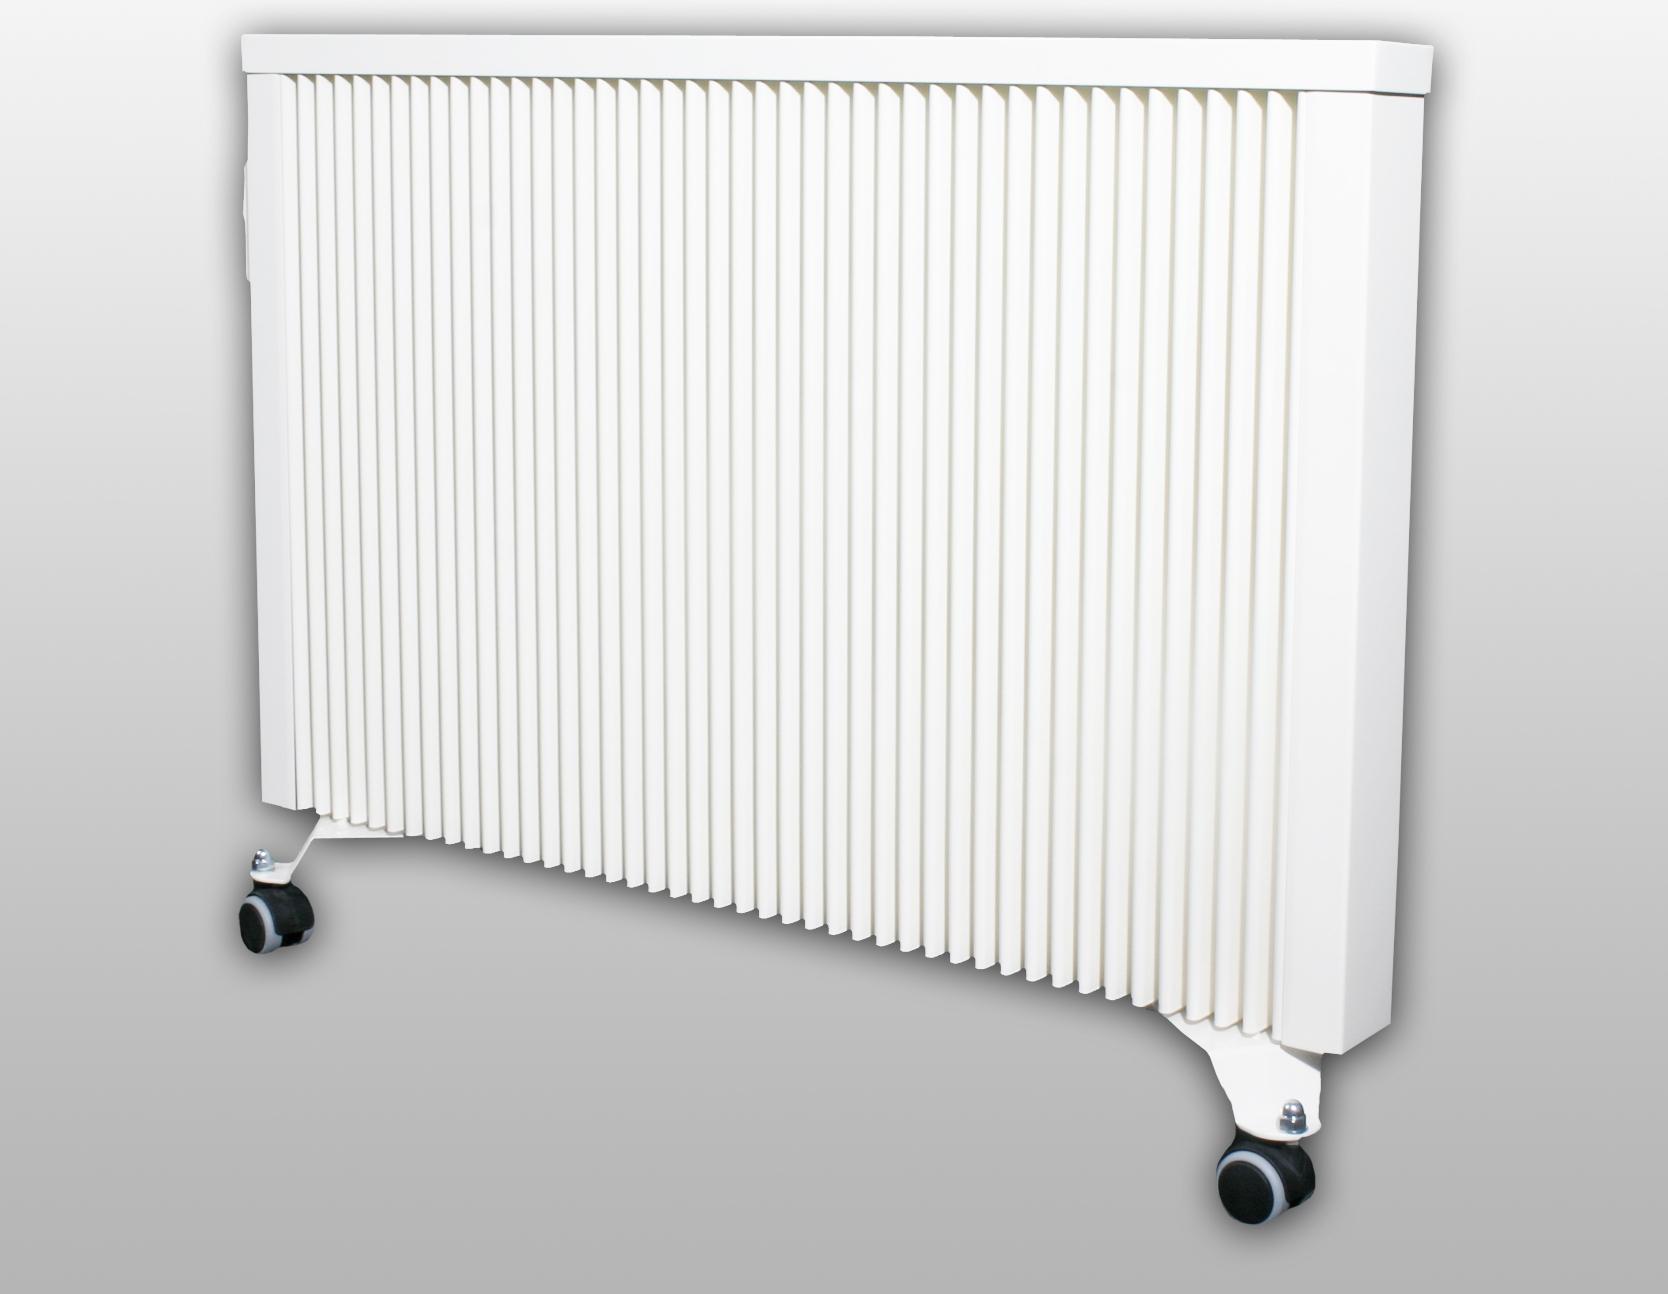 Topný panel série H, TYP H201, 2000 W